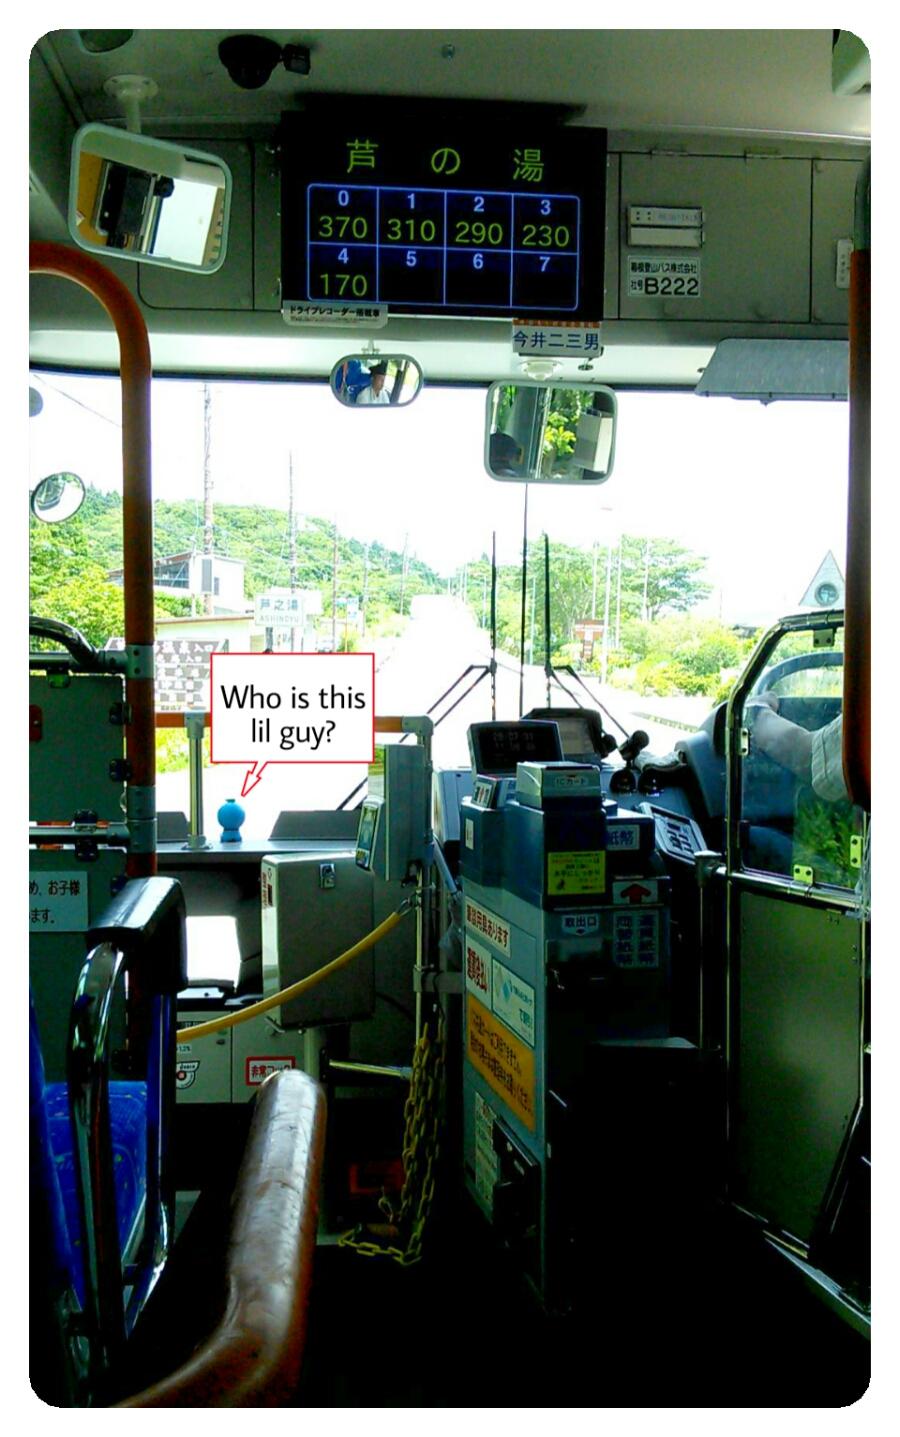 insidethebus